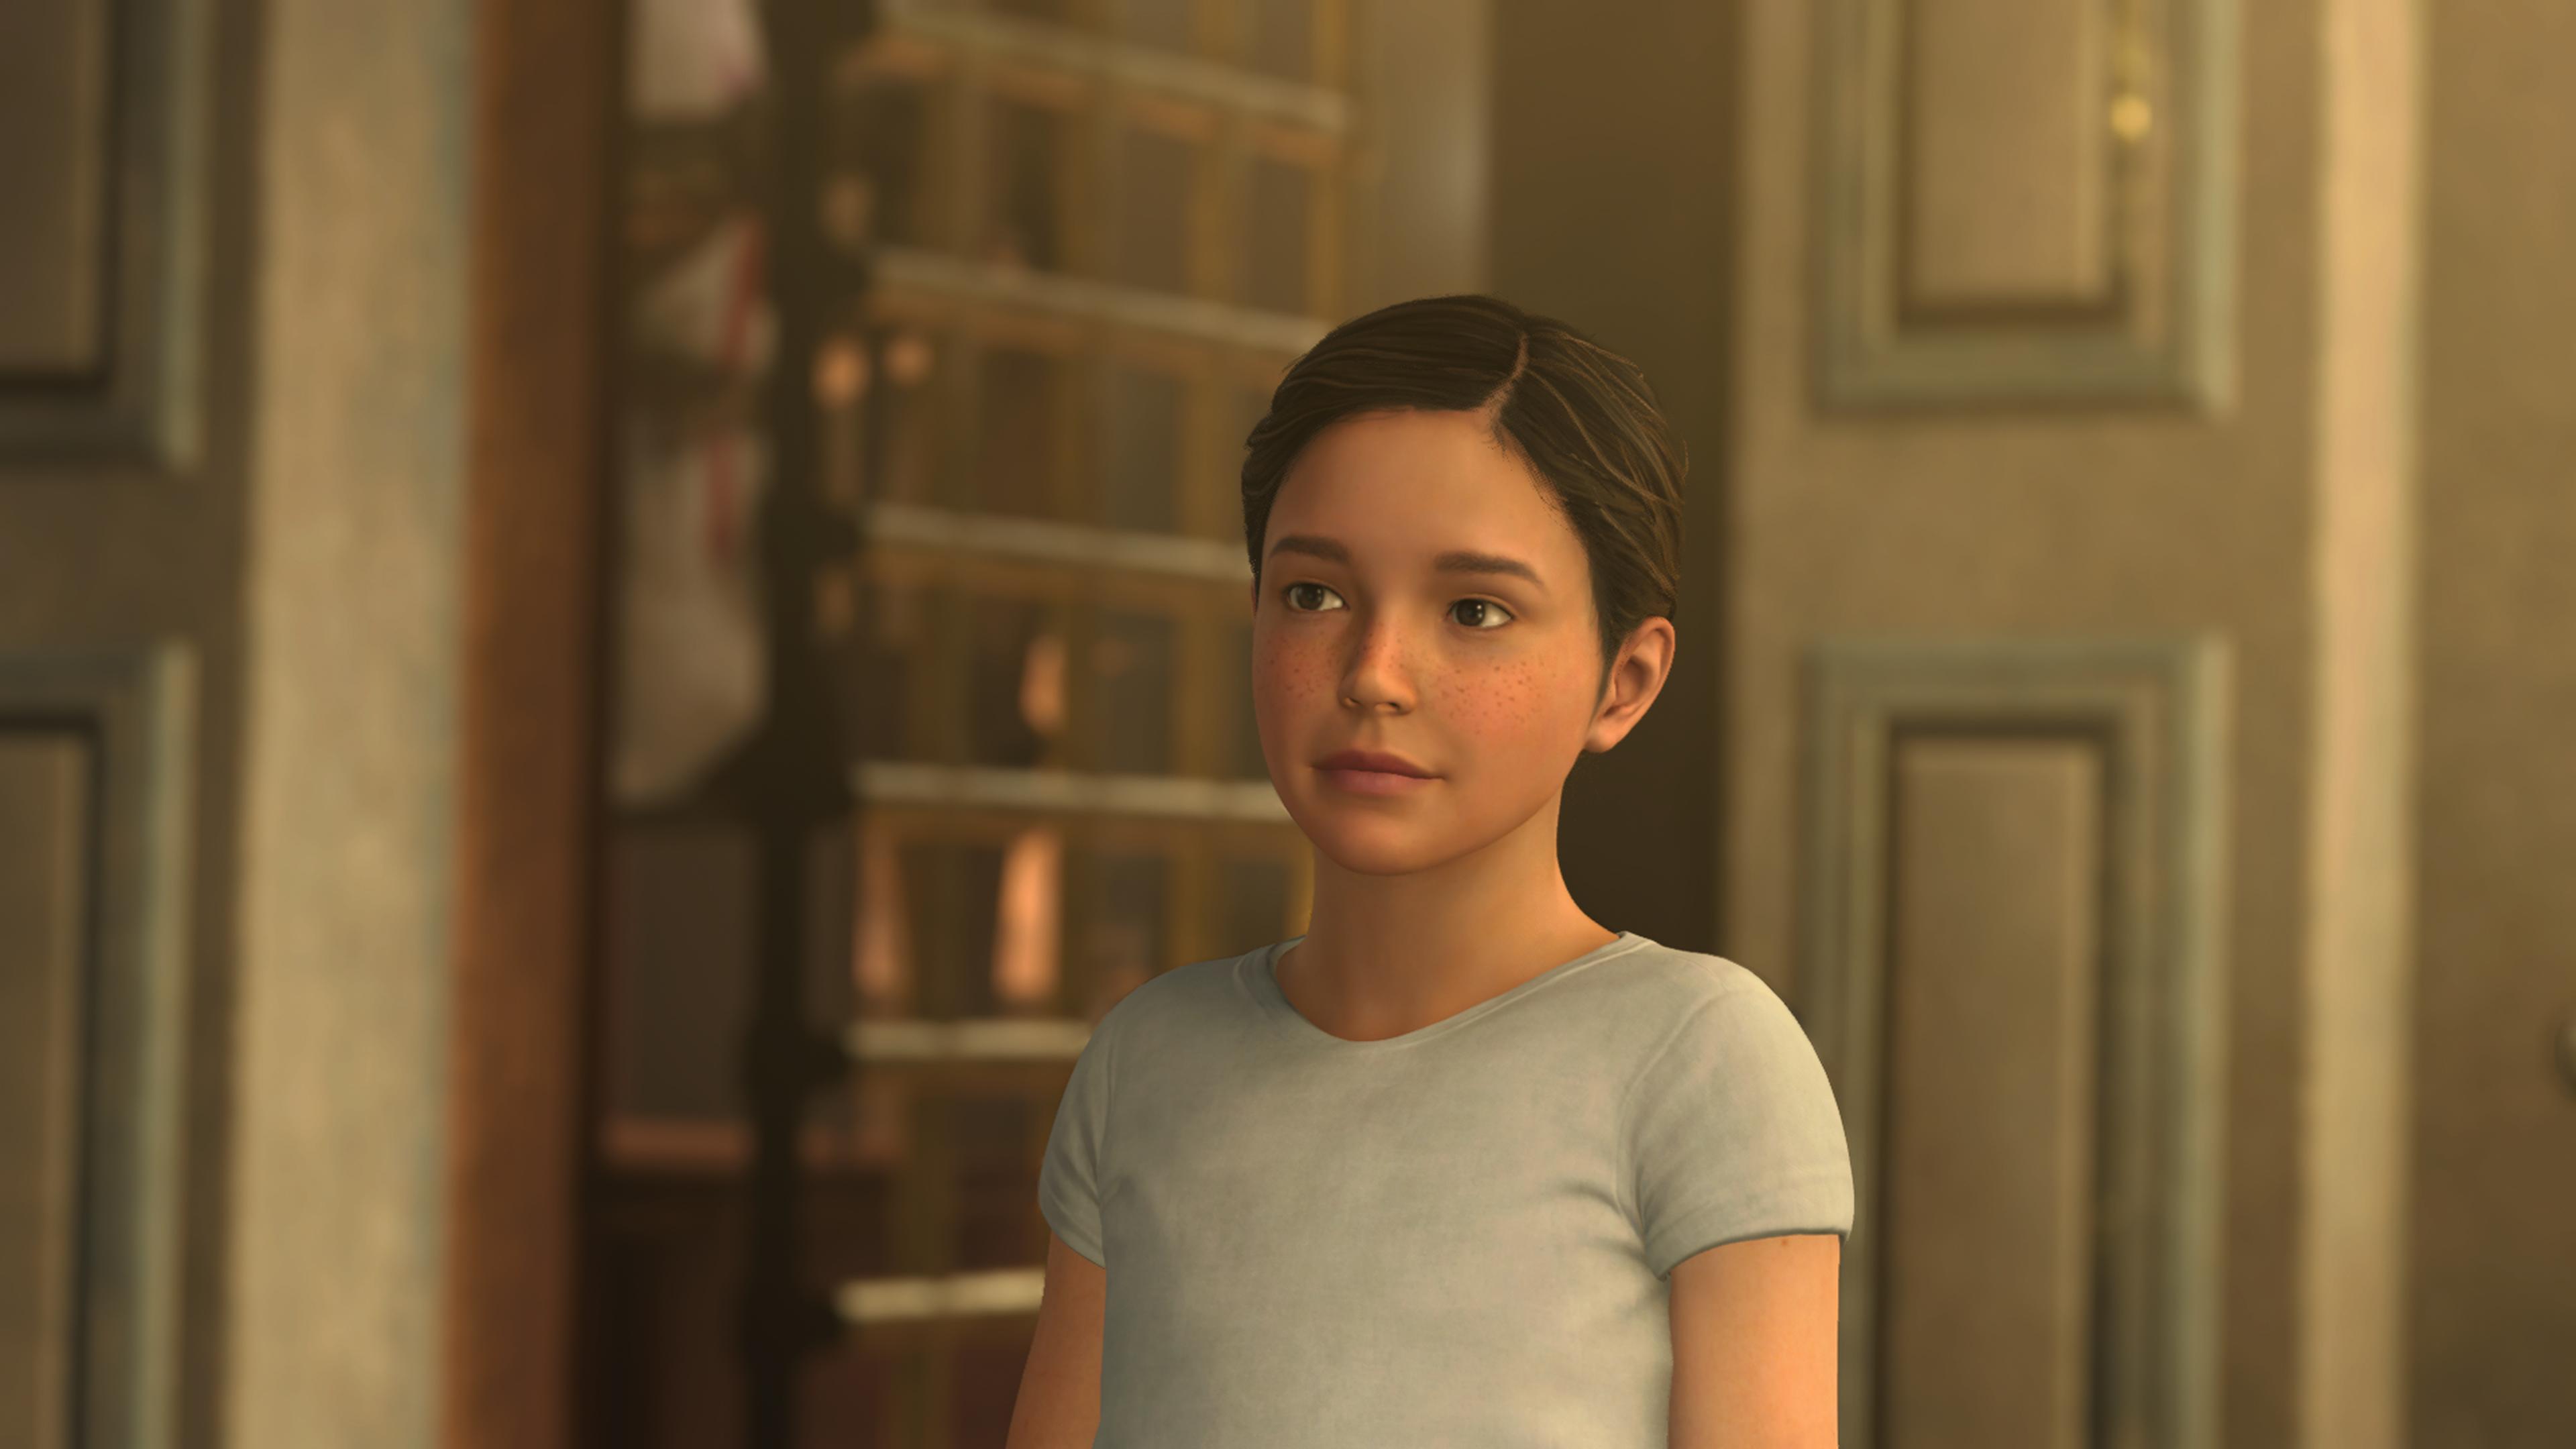 Young Lara Croft By Fonzzz002 On Deviantart